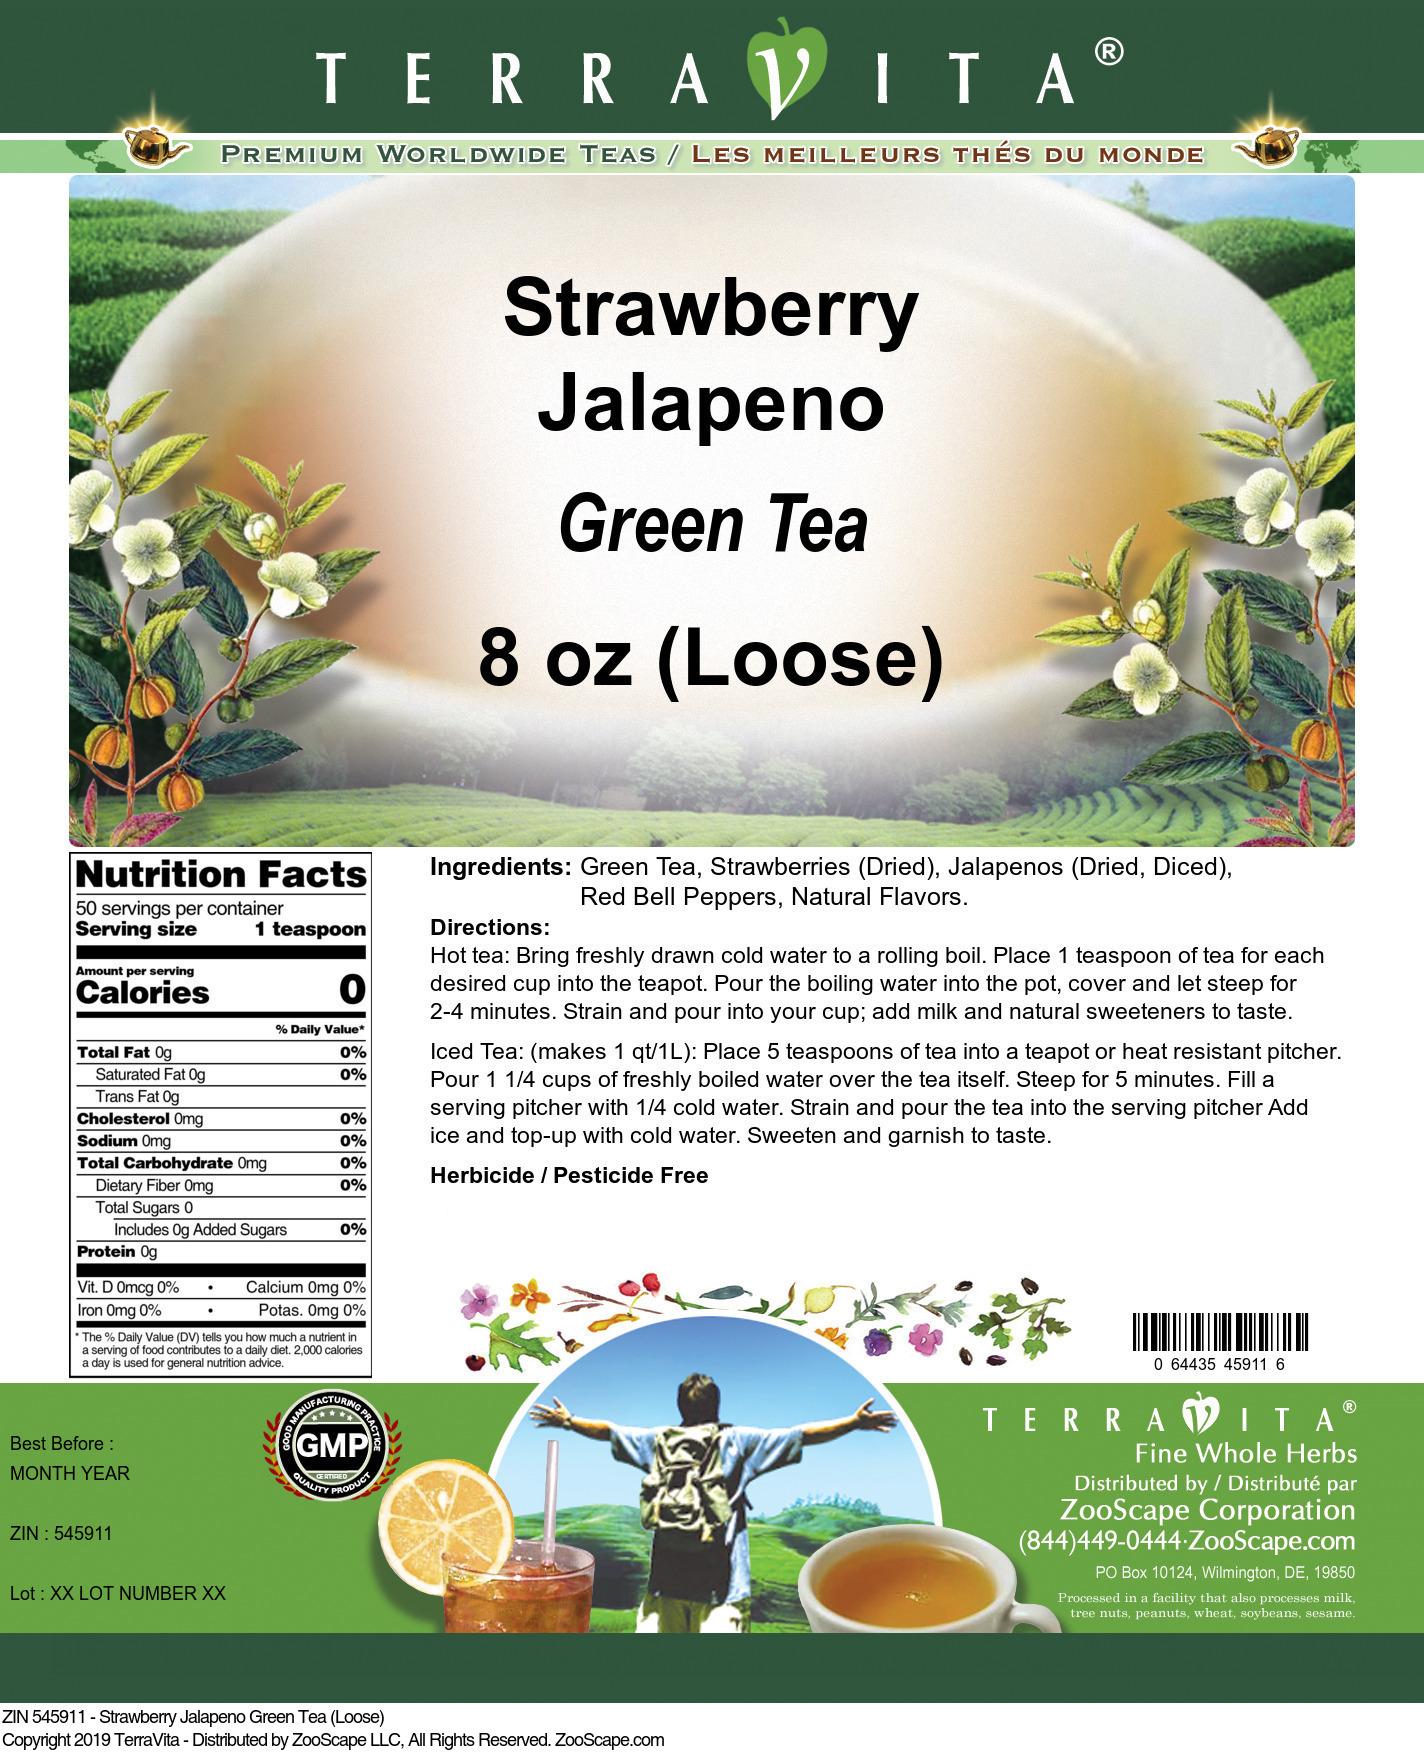 Strawberry Jalapeno Green Tea